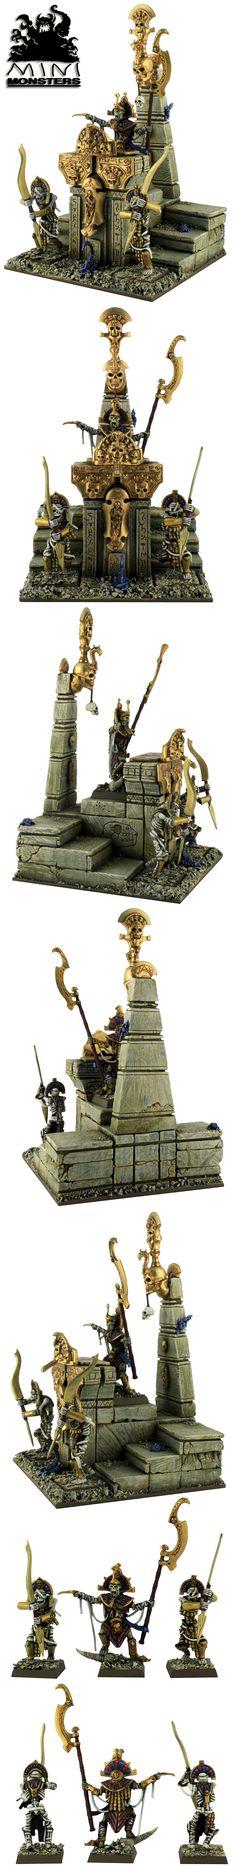 Tomb Kings Casket of Souls.jpg 618×4,887 pixels